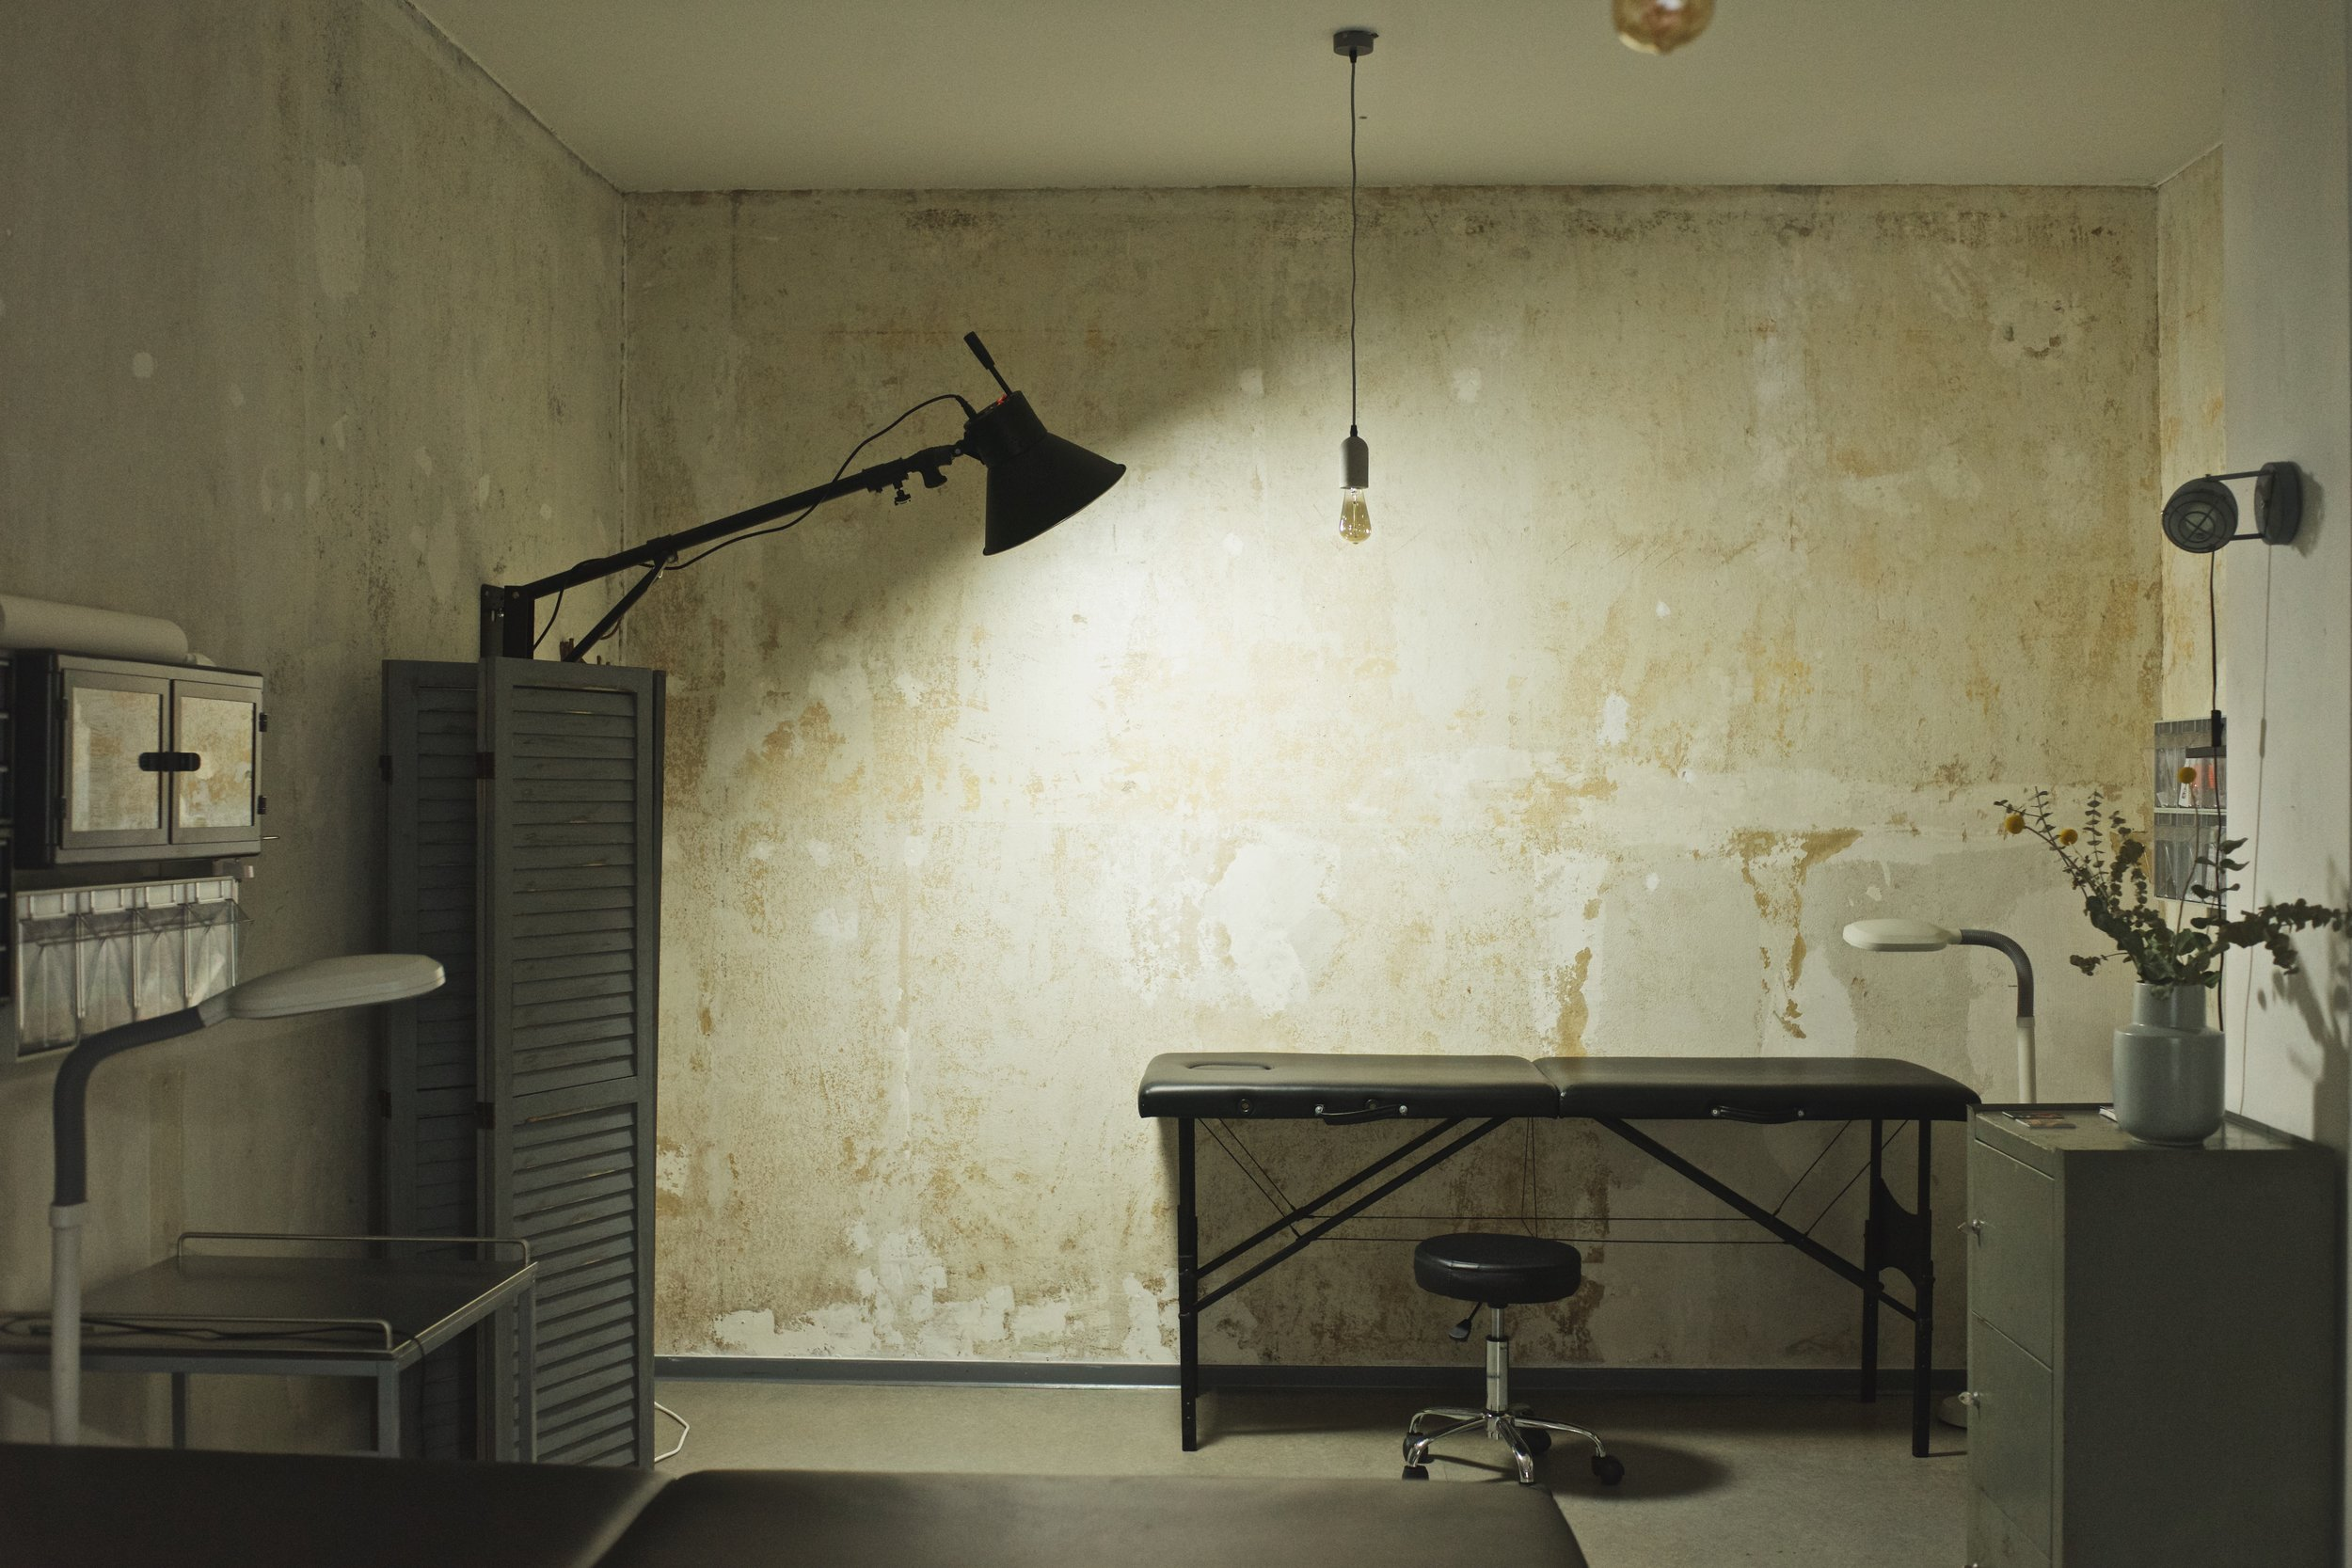 NOIA BERLIN Tattoo Studio & Art